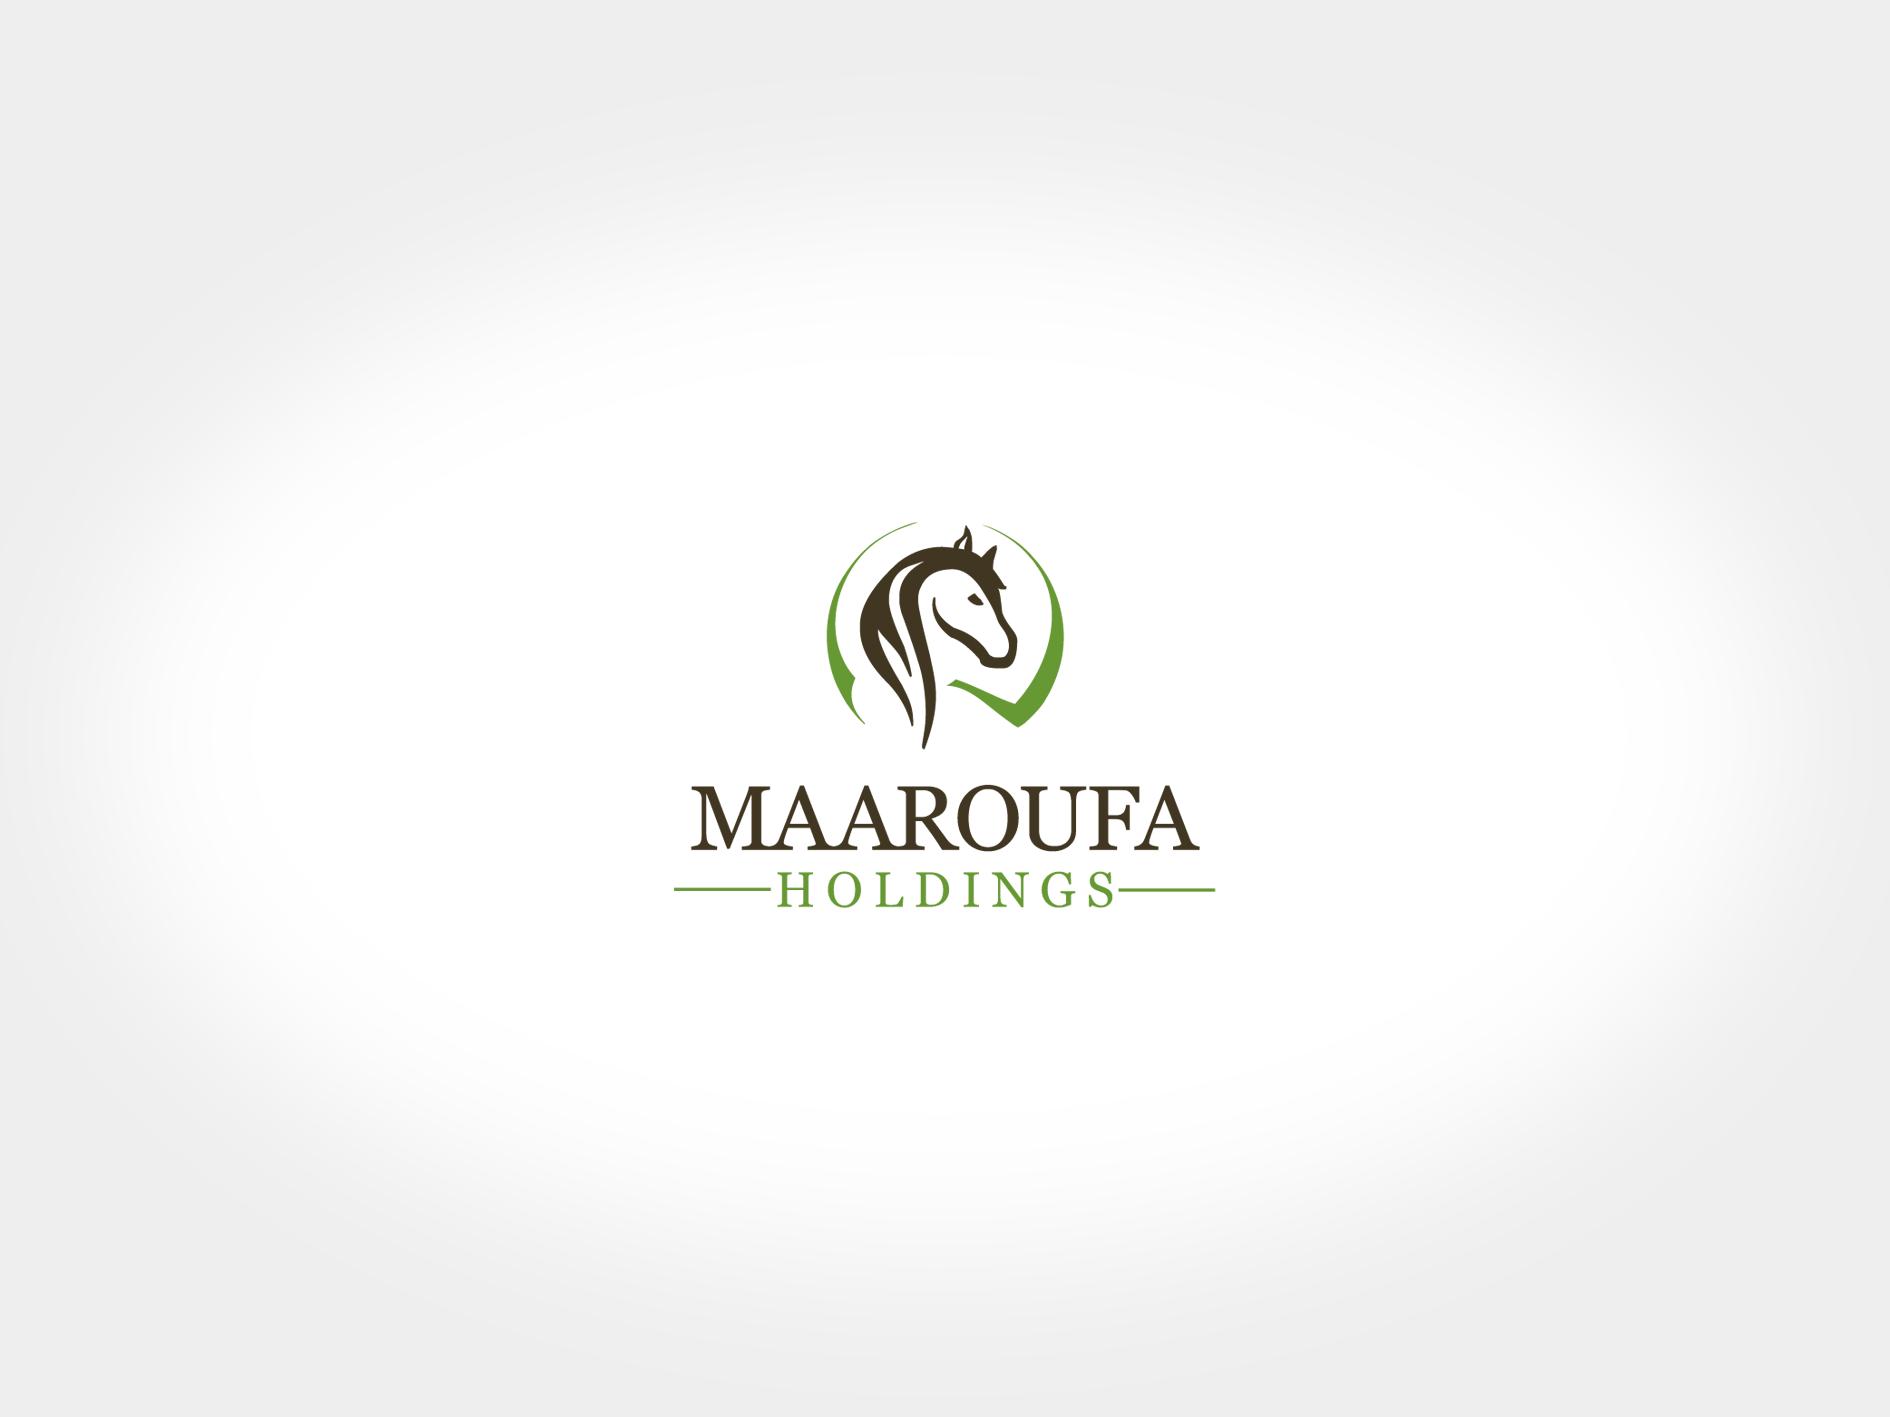 Maaroufa Holdings needs a new logo